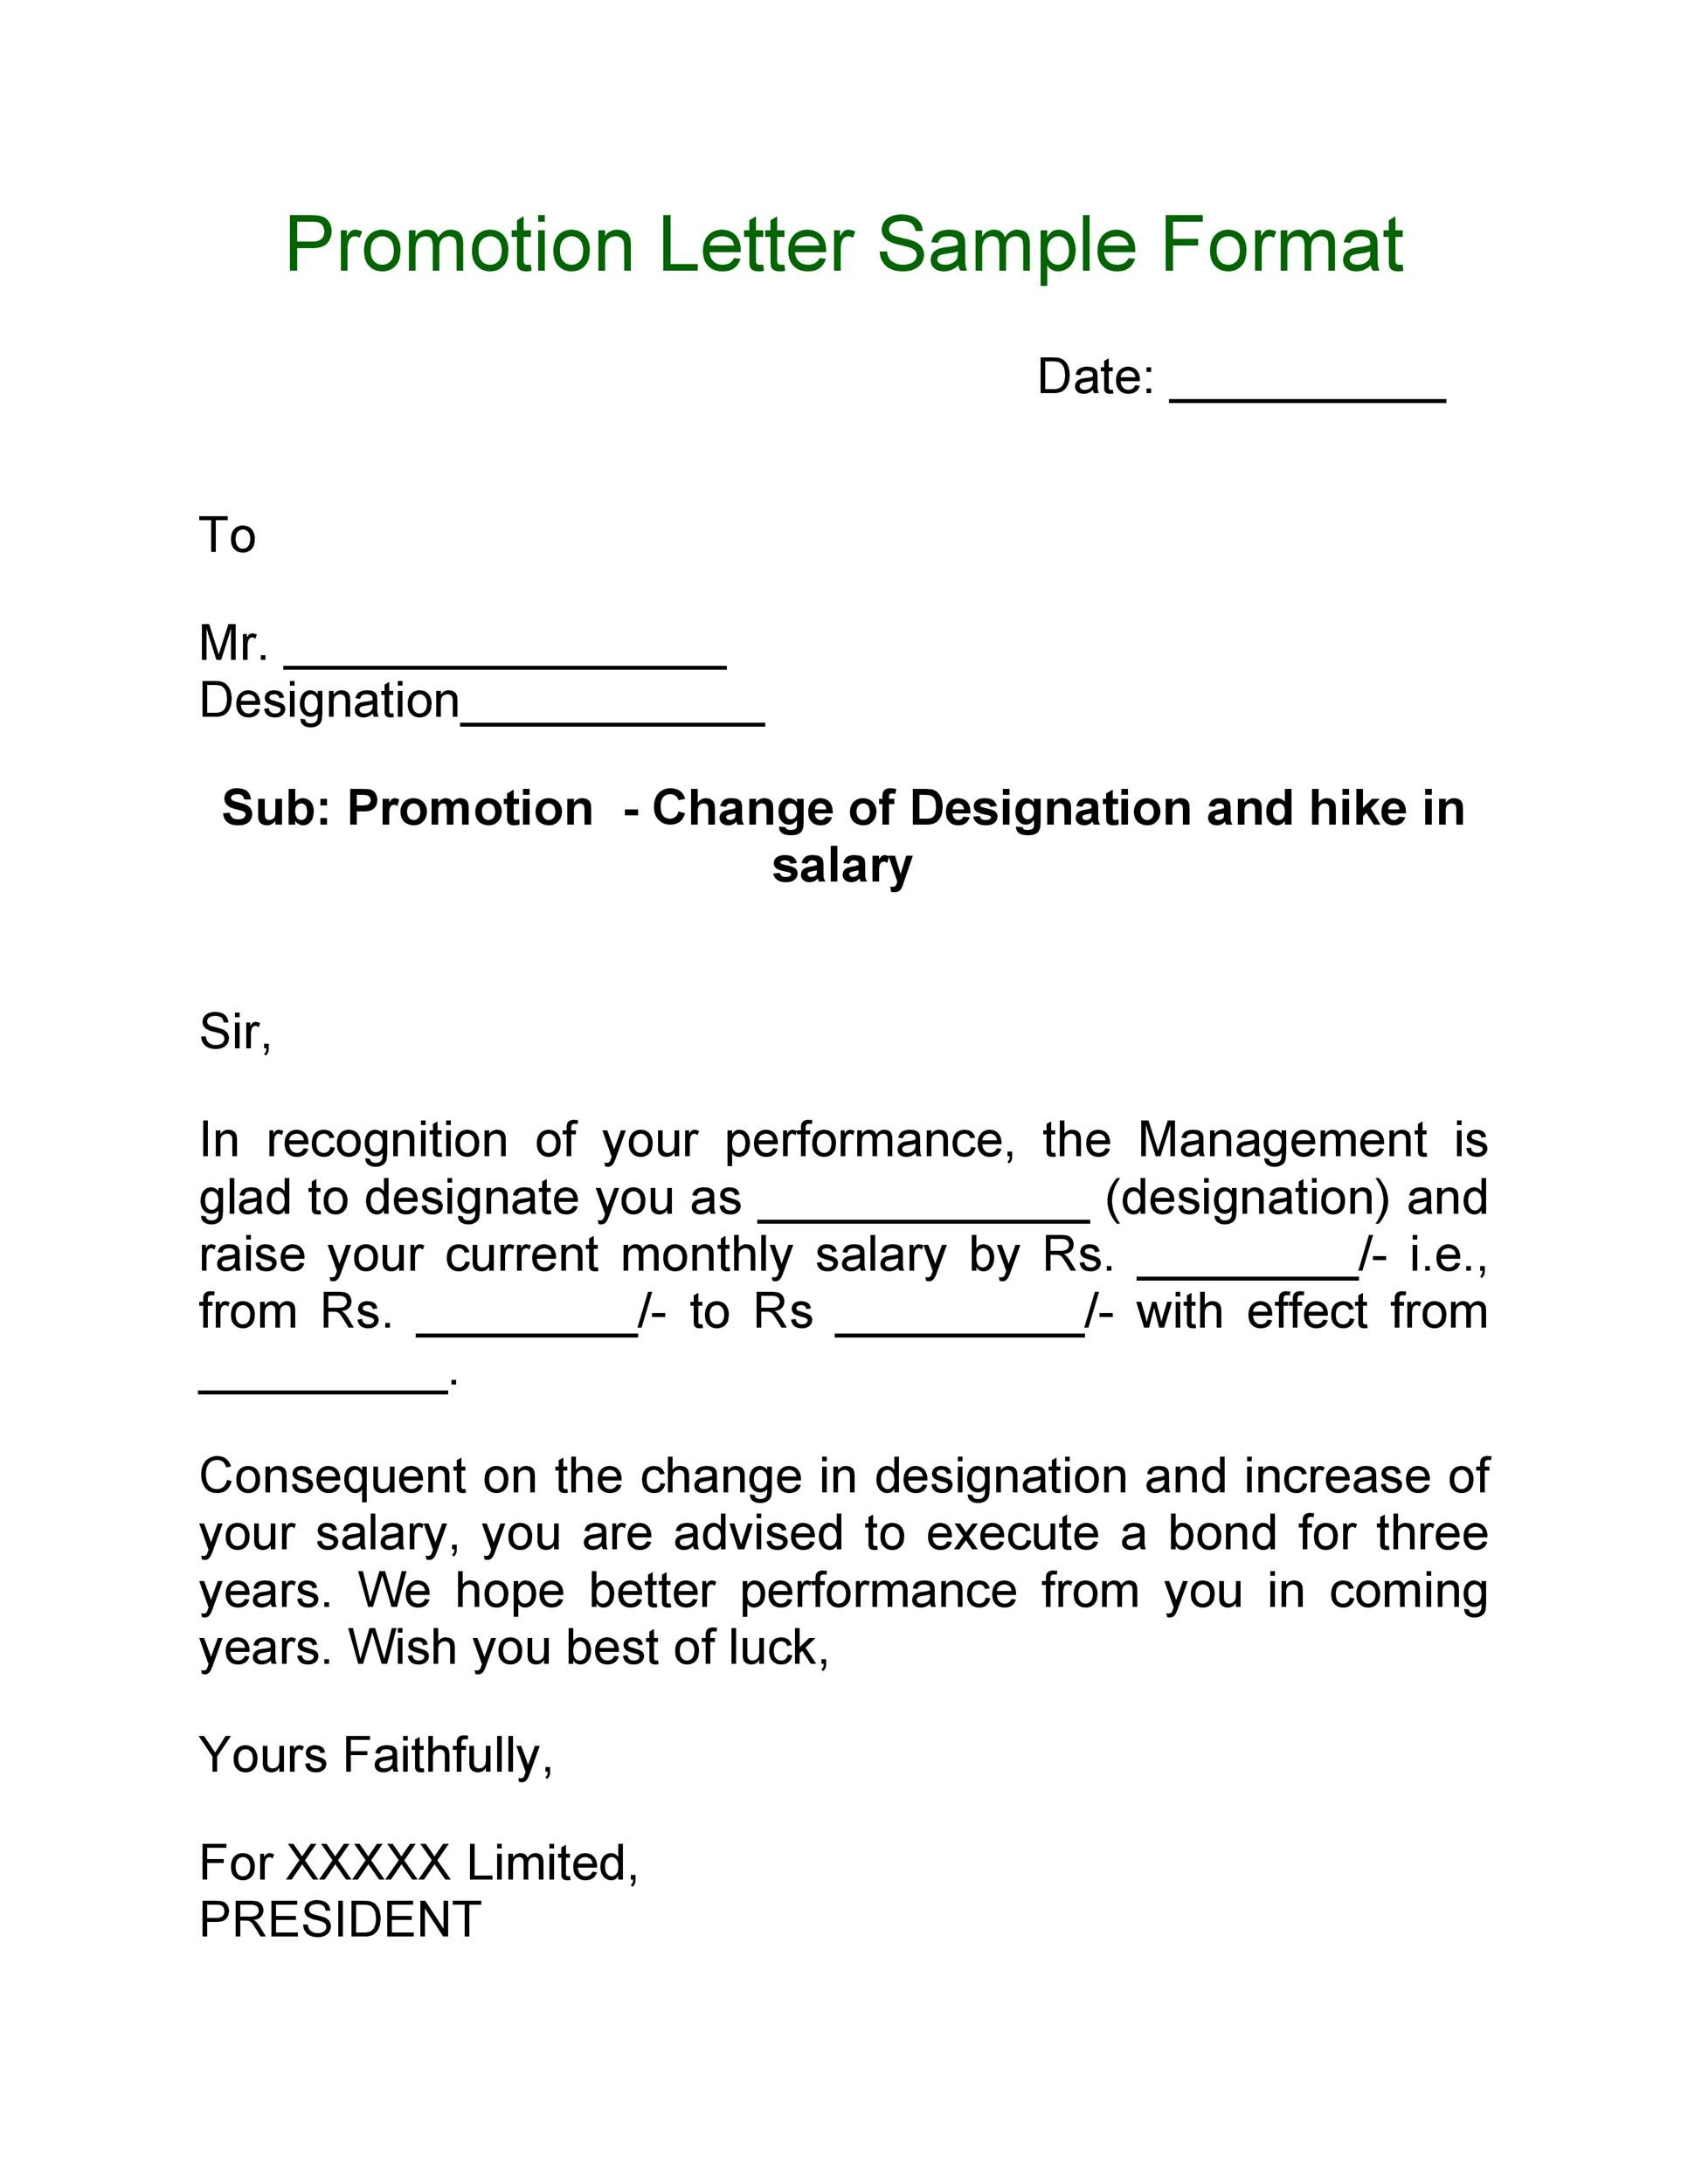 Free promotion letter 14